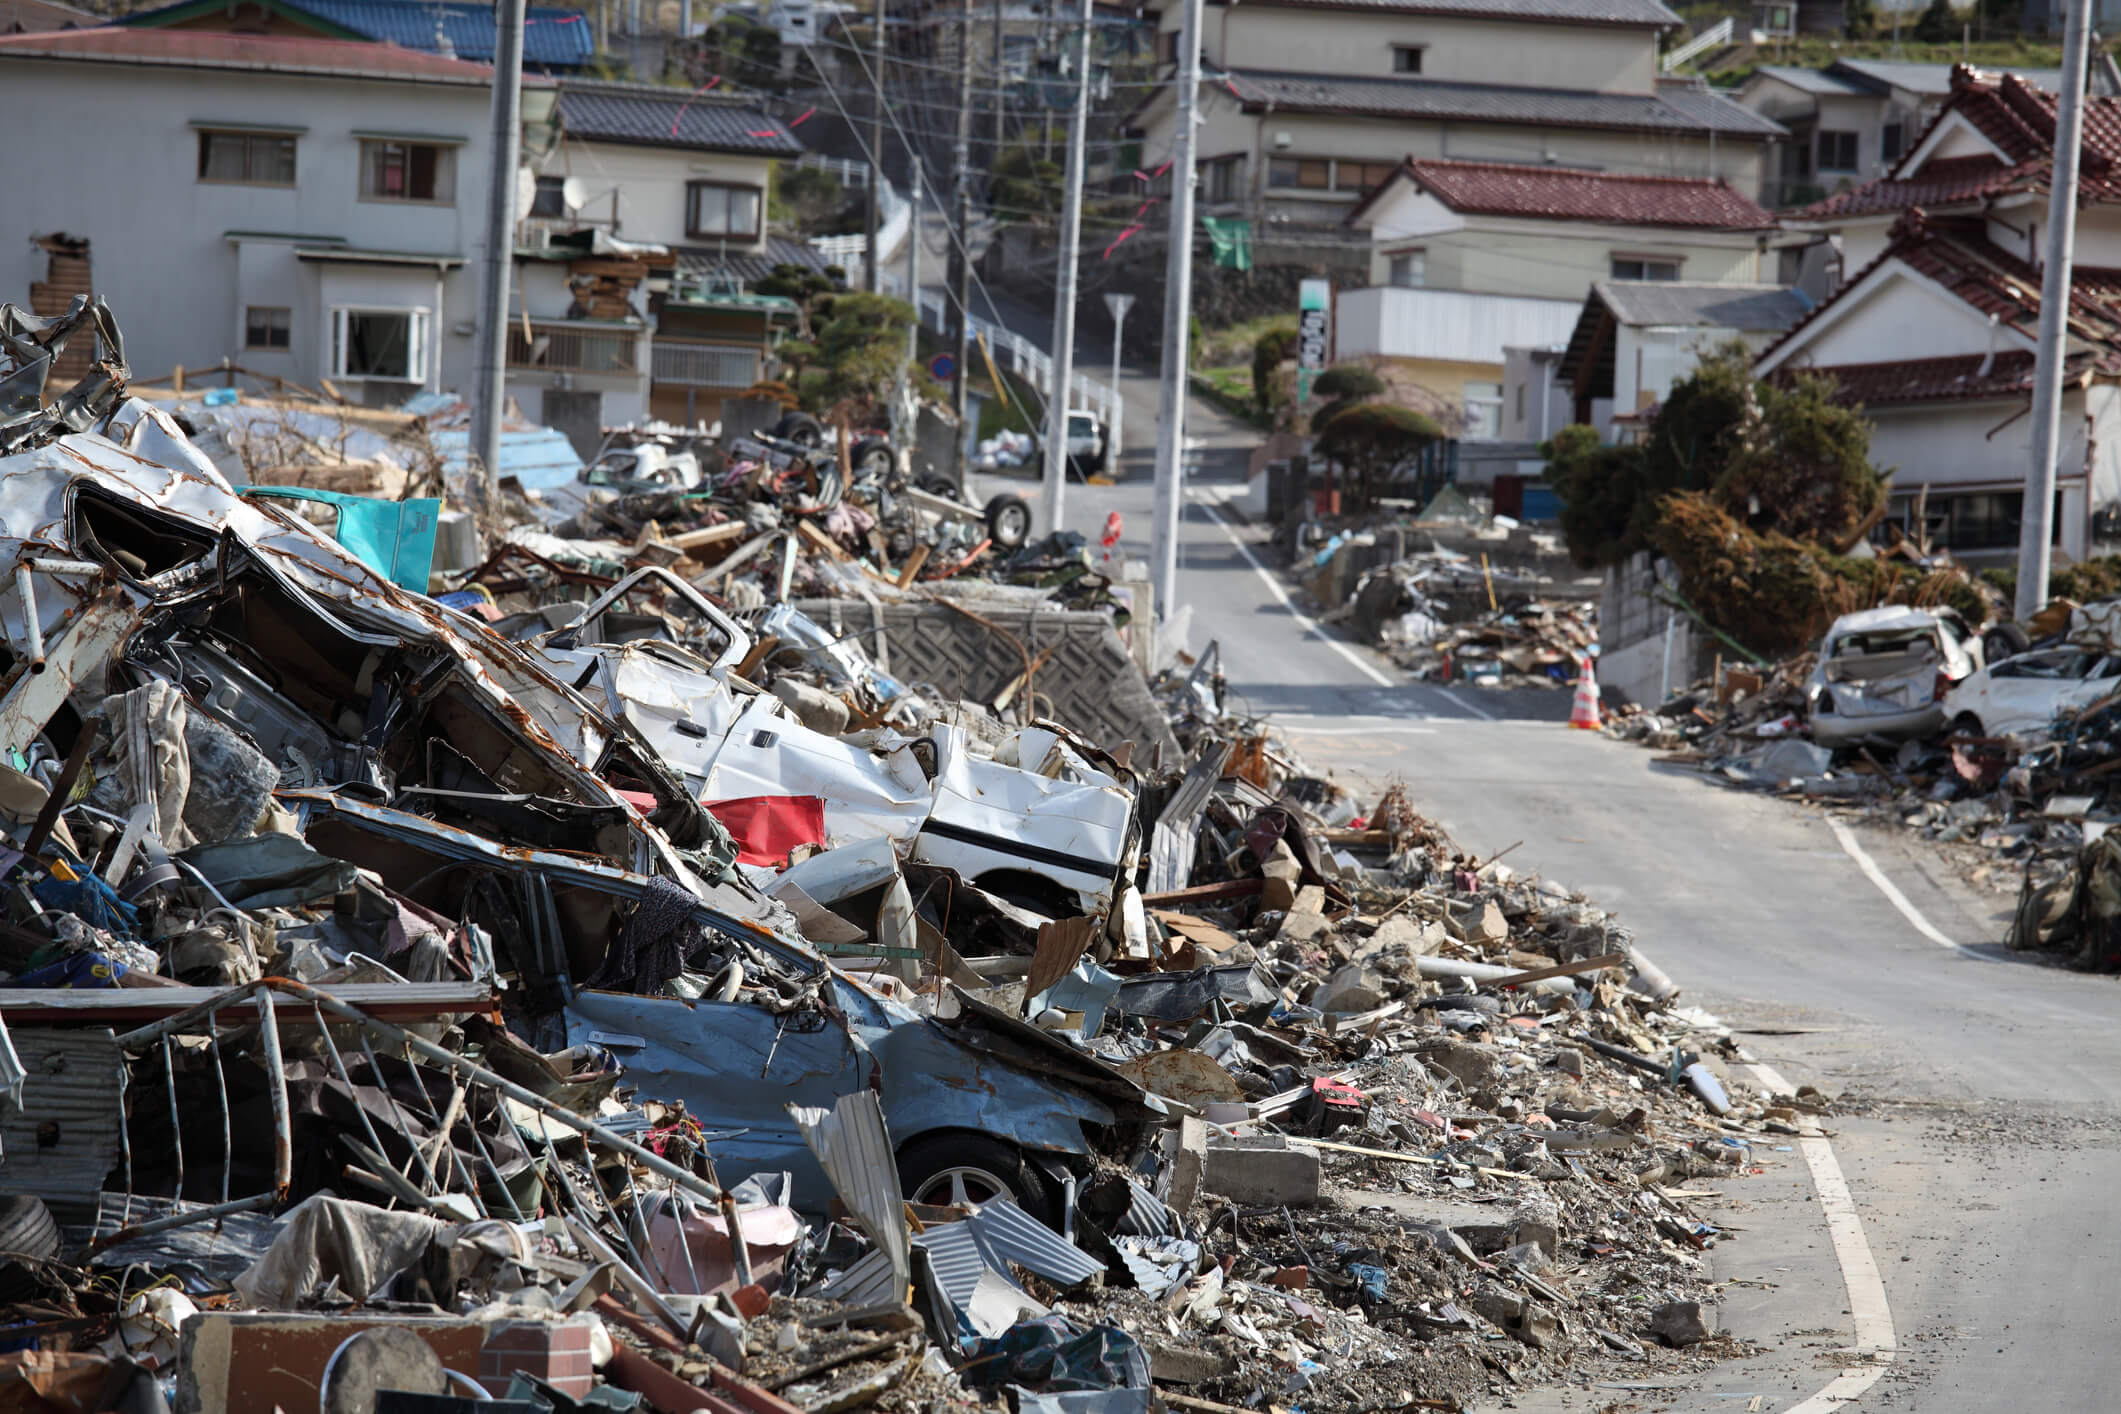 devastation in Tohoku 2011 tsunami flyjin